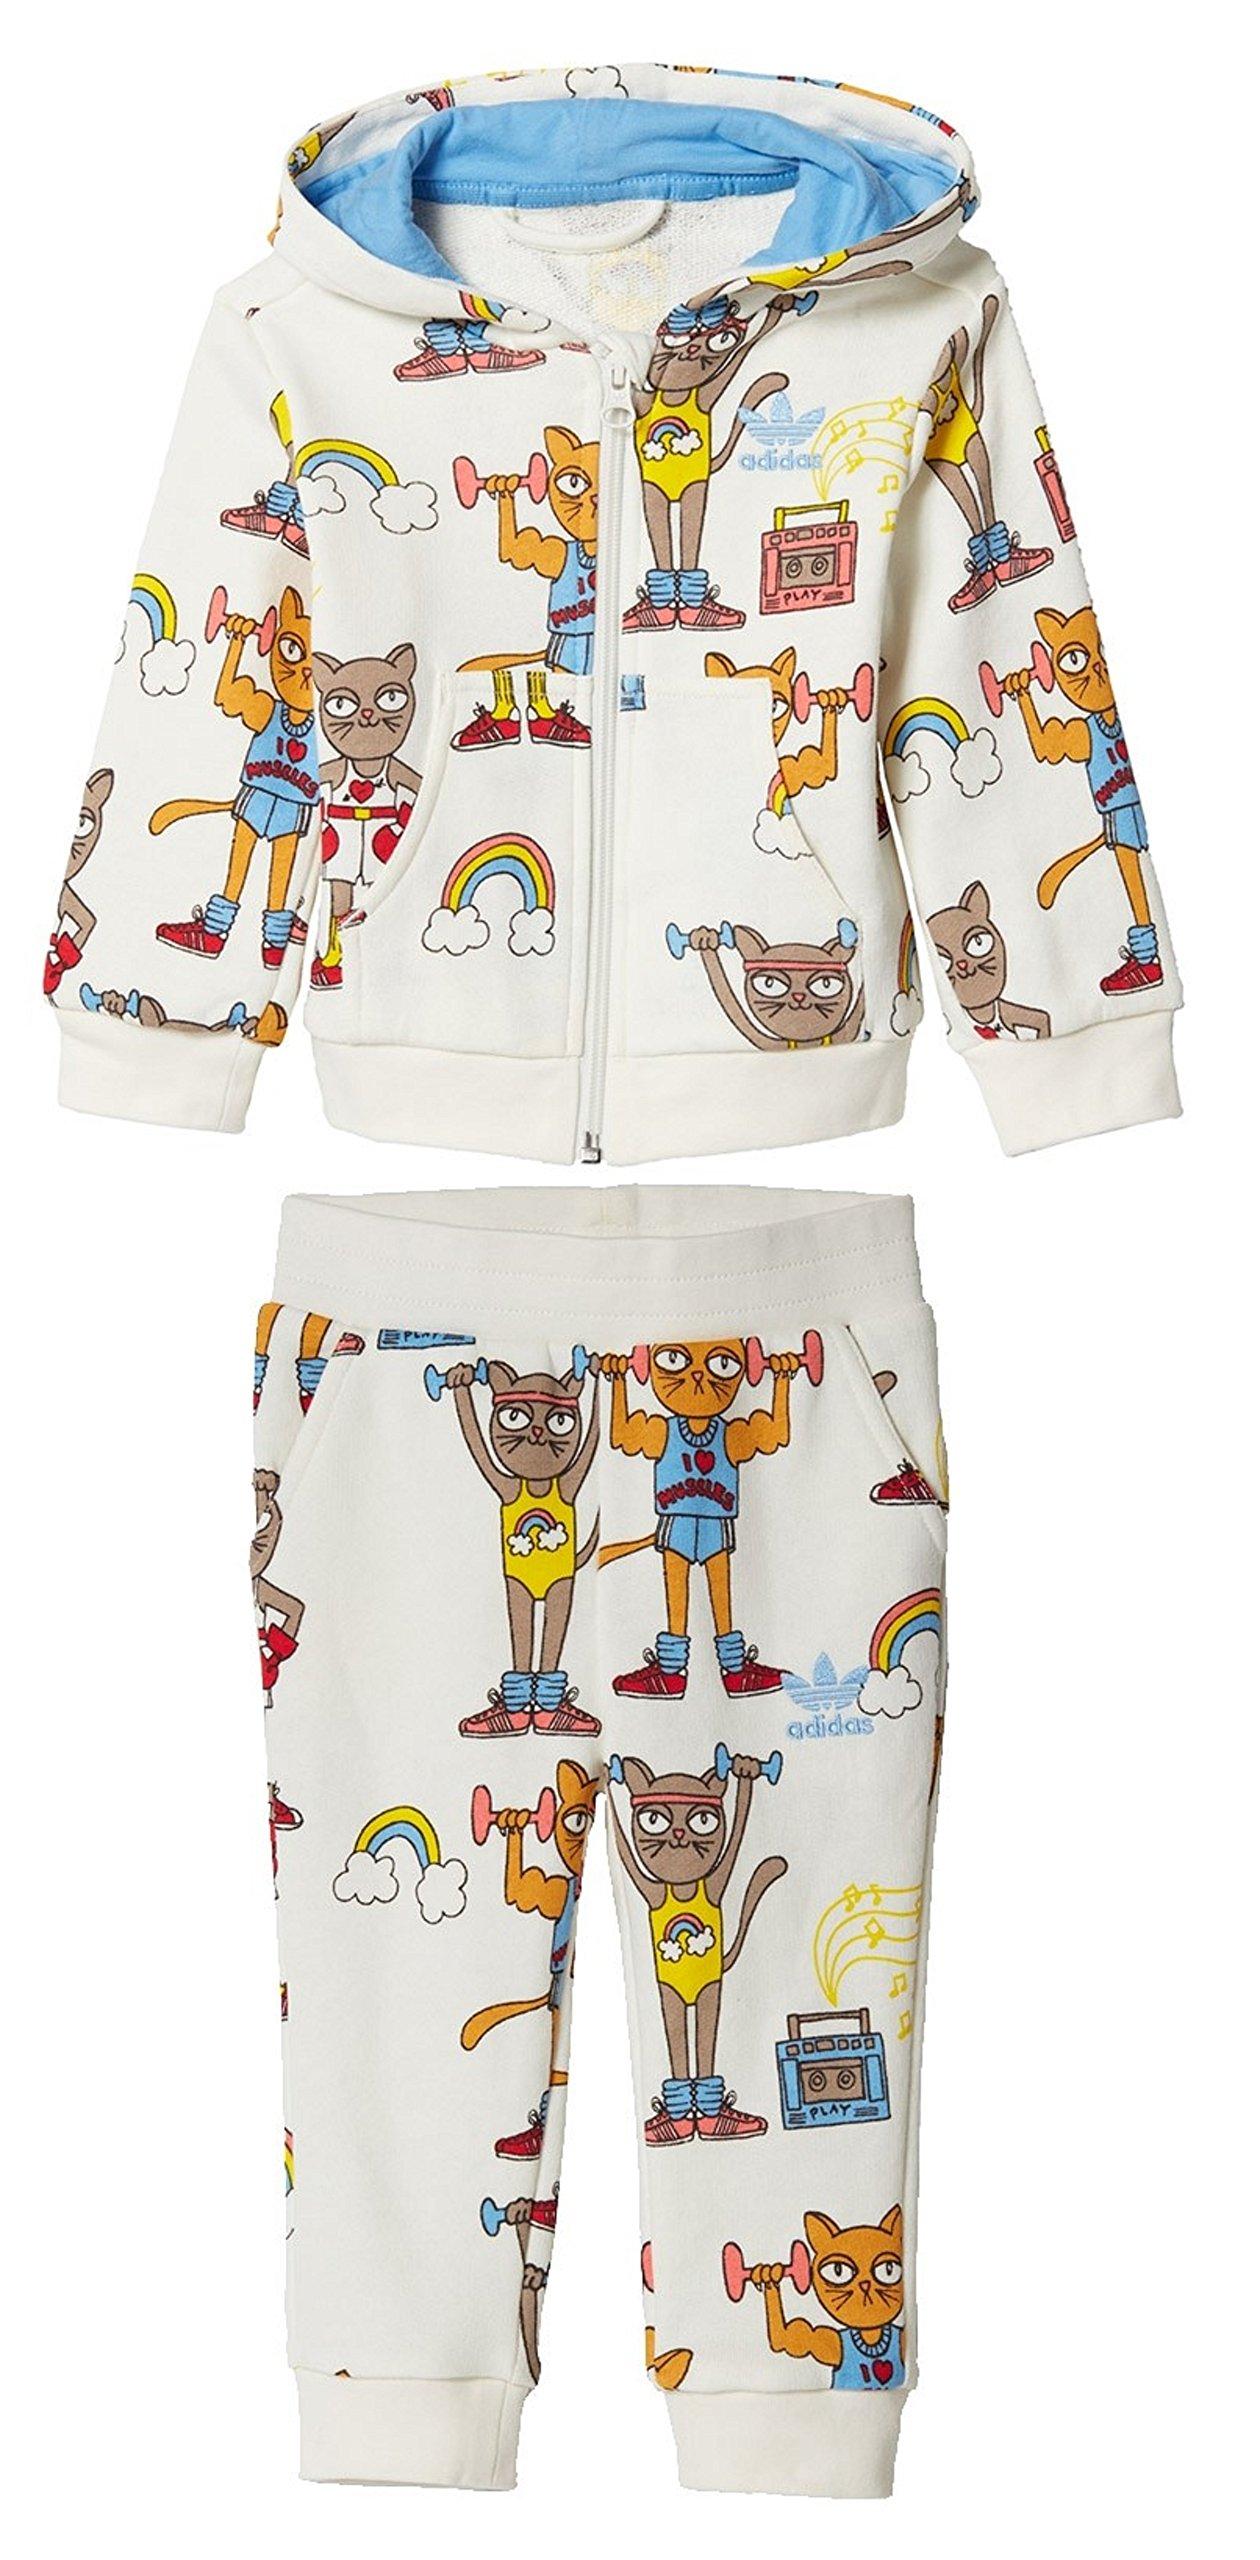 46a3b47c3 Galleon - Adidas Originals Kids' Hooded Tracksuit Mini Rodini Tricot Zip  Jacket And Pant Set (2T, Mini Rodini)